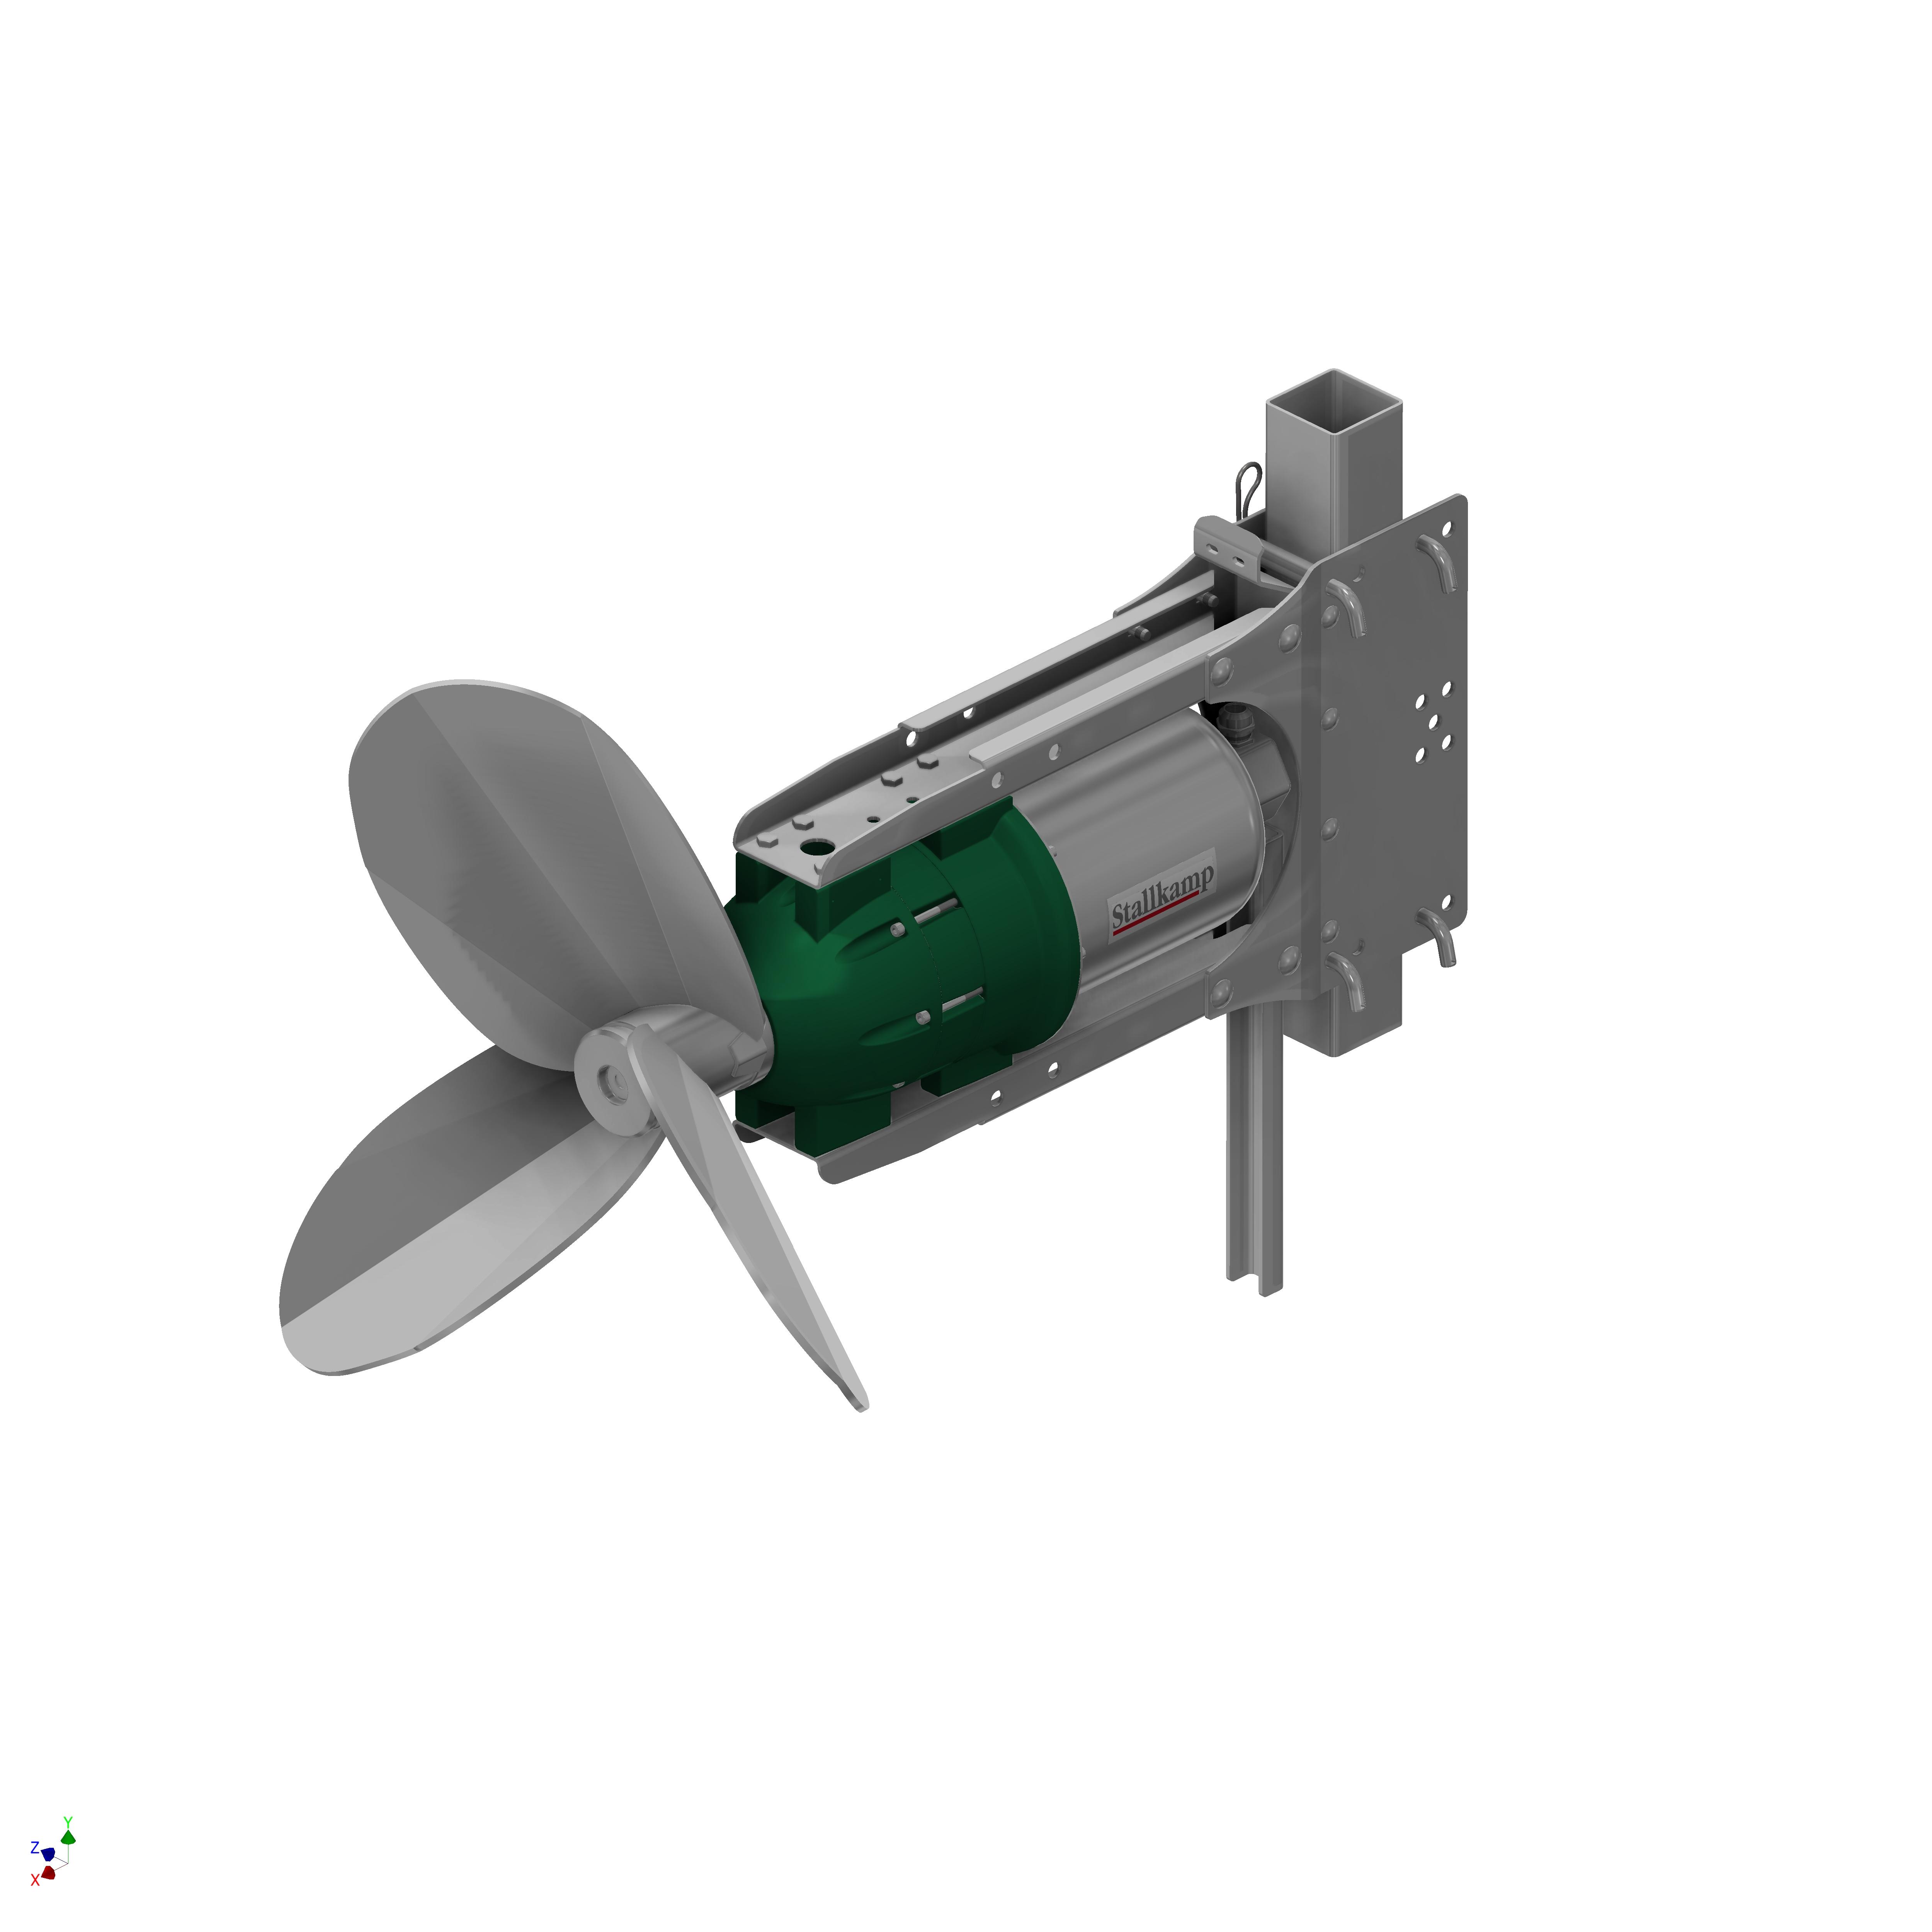 Stallkamp submersible motor agitator, mixer - Erich Stallkamp ESTA GmbH